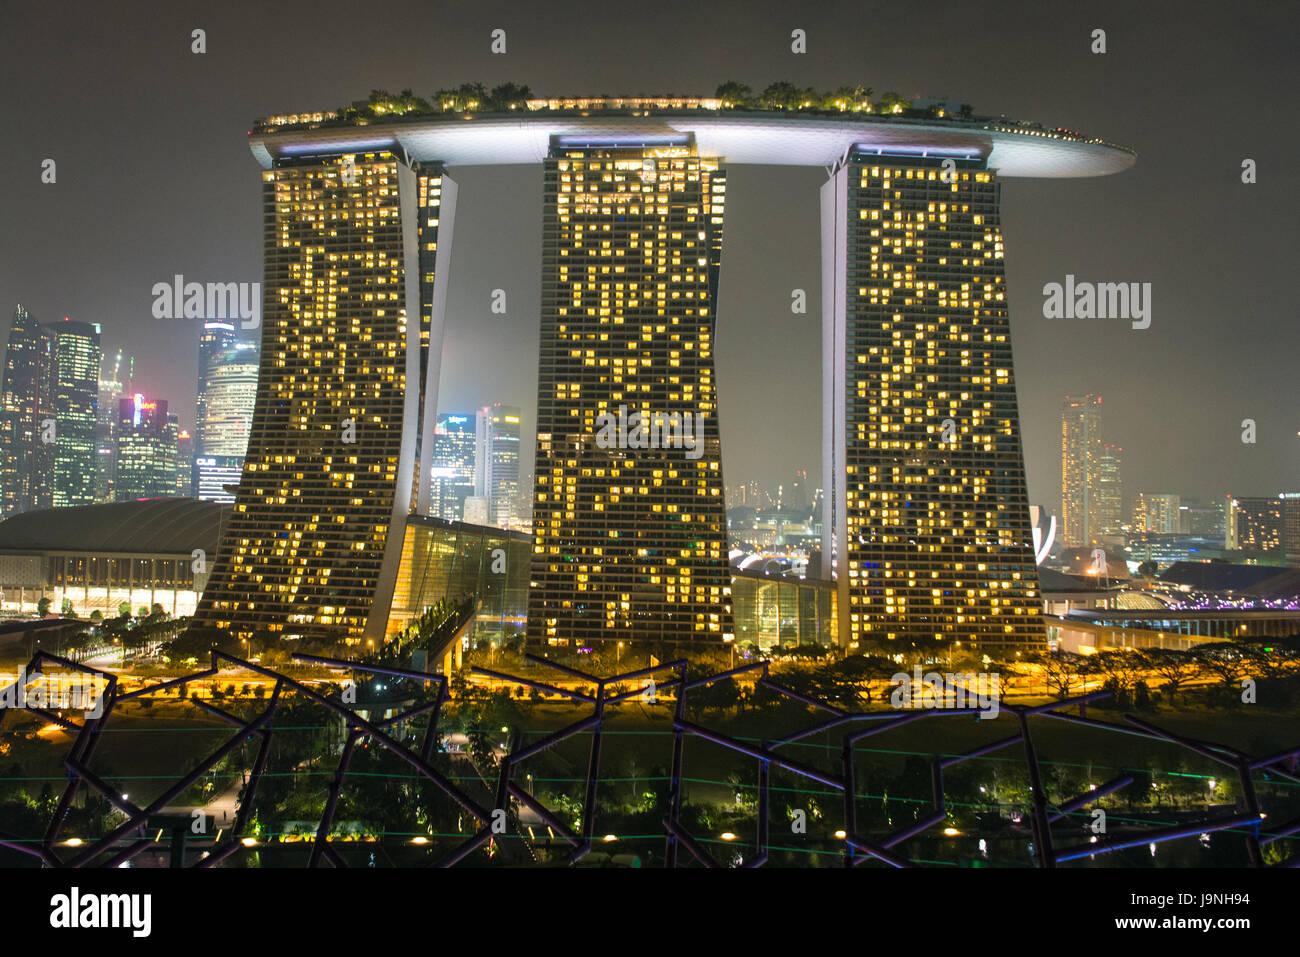 Marina Bay Sands hotel at night, Singapore. - Stock Image